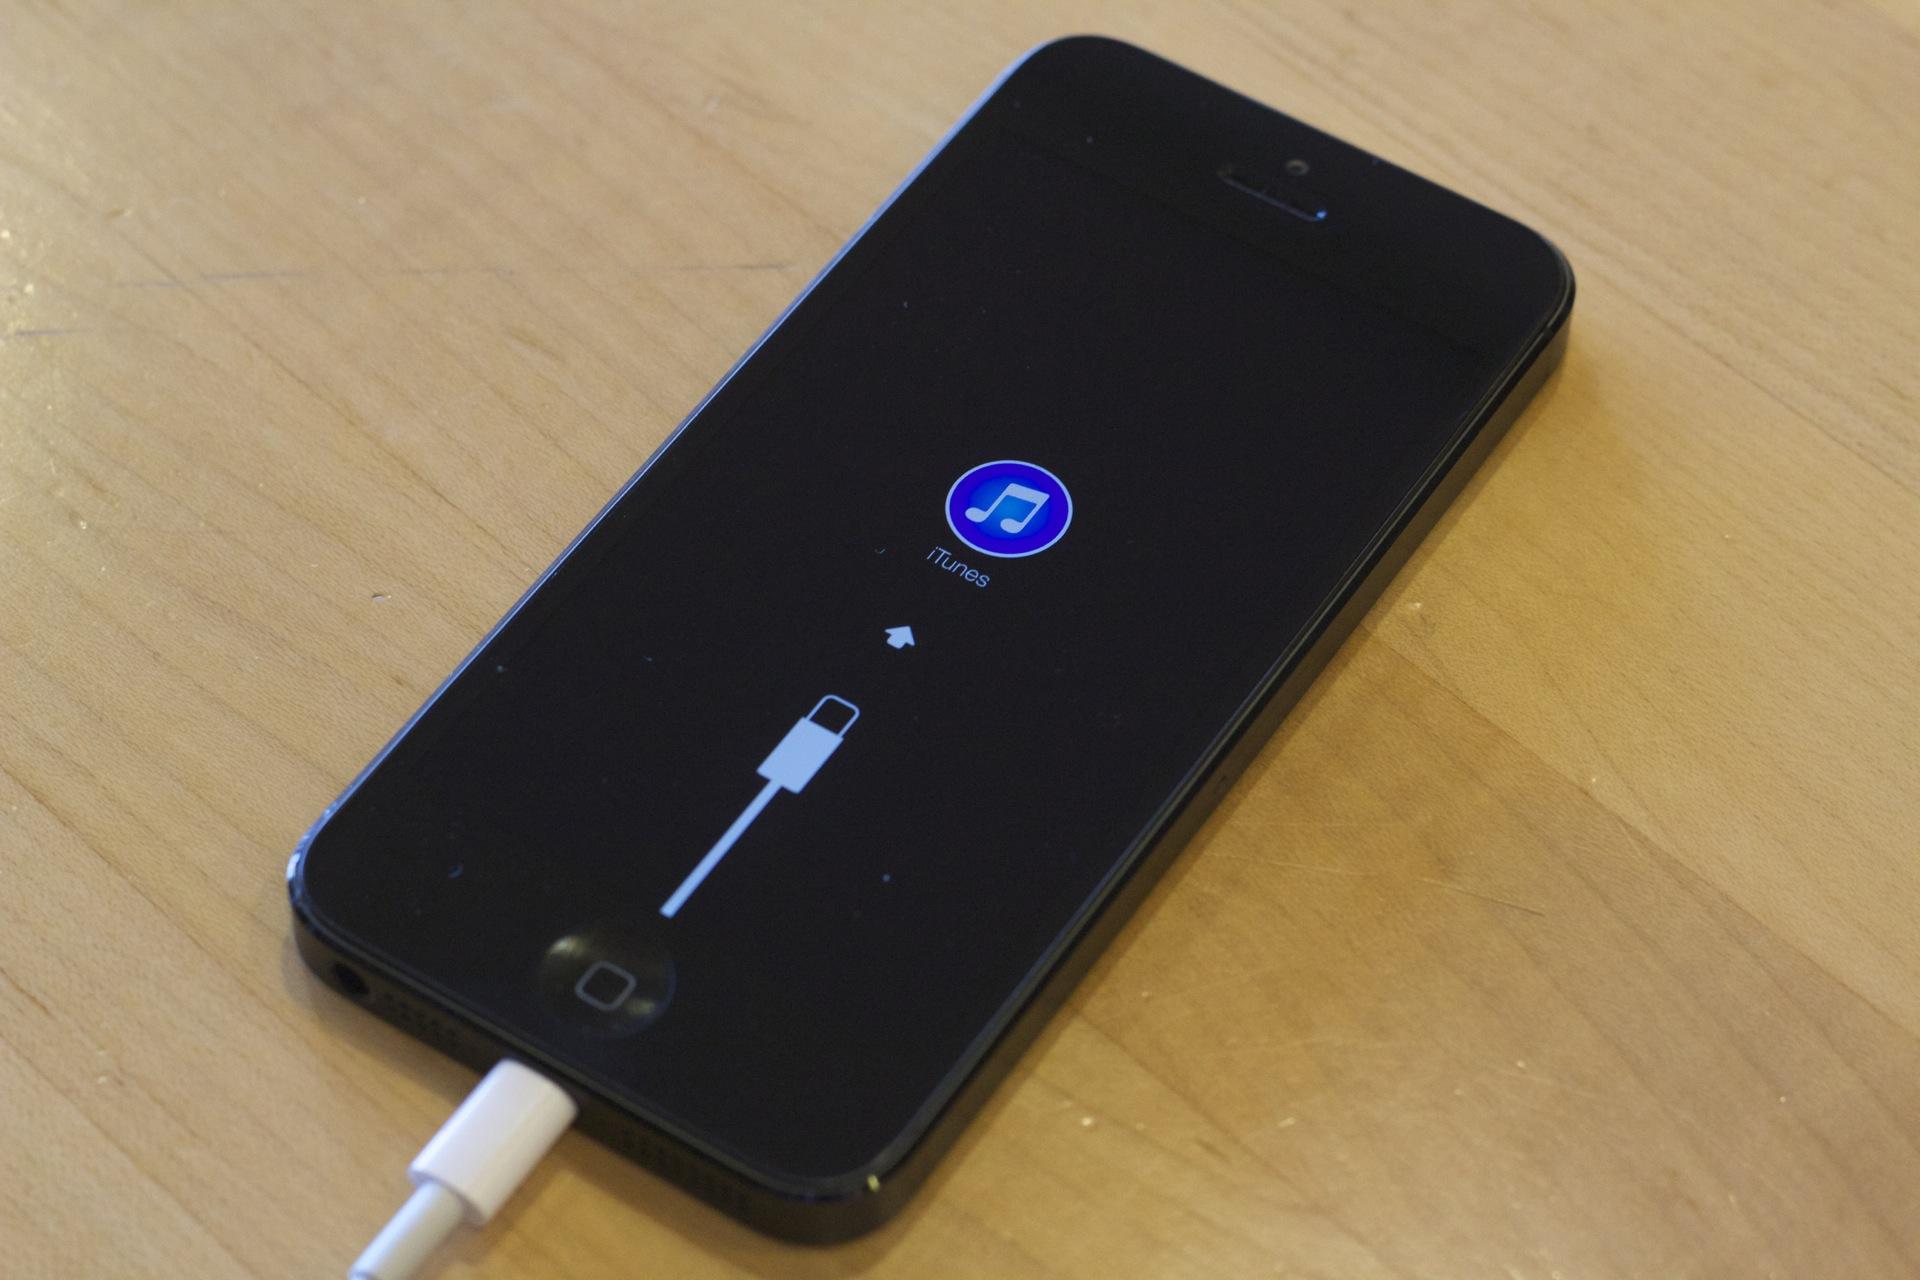 On Sun June 23rd 2013 Ios 7 Ios 7 Beta Ios Hacks Iphone 4 Root Acc ...